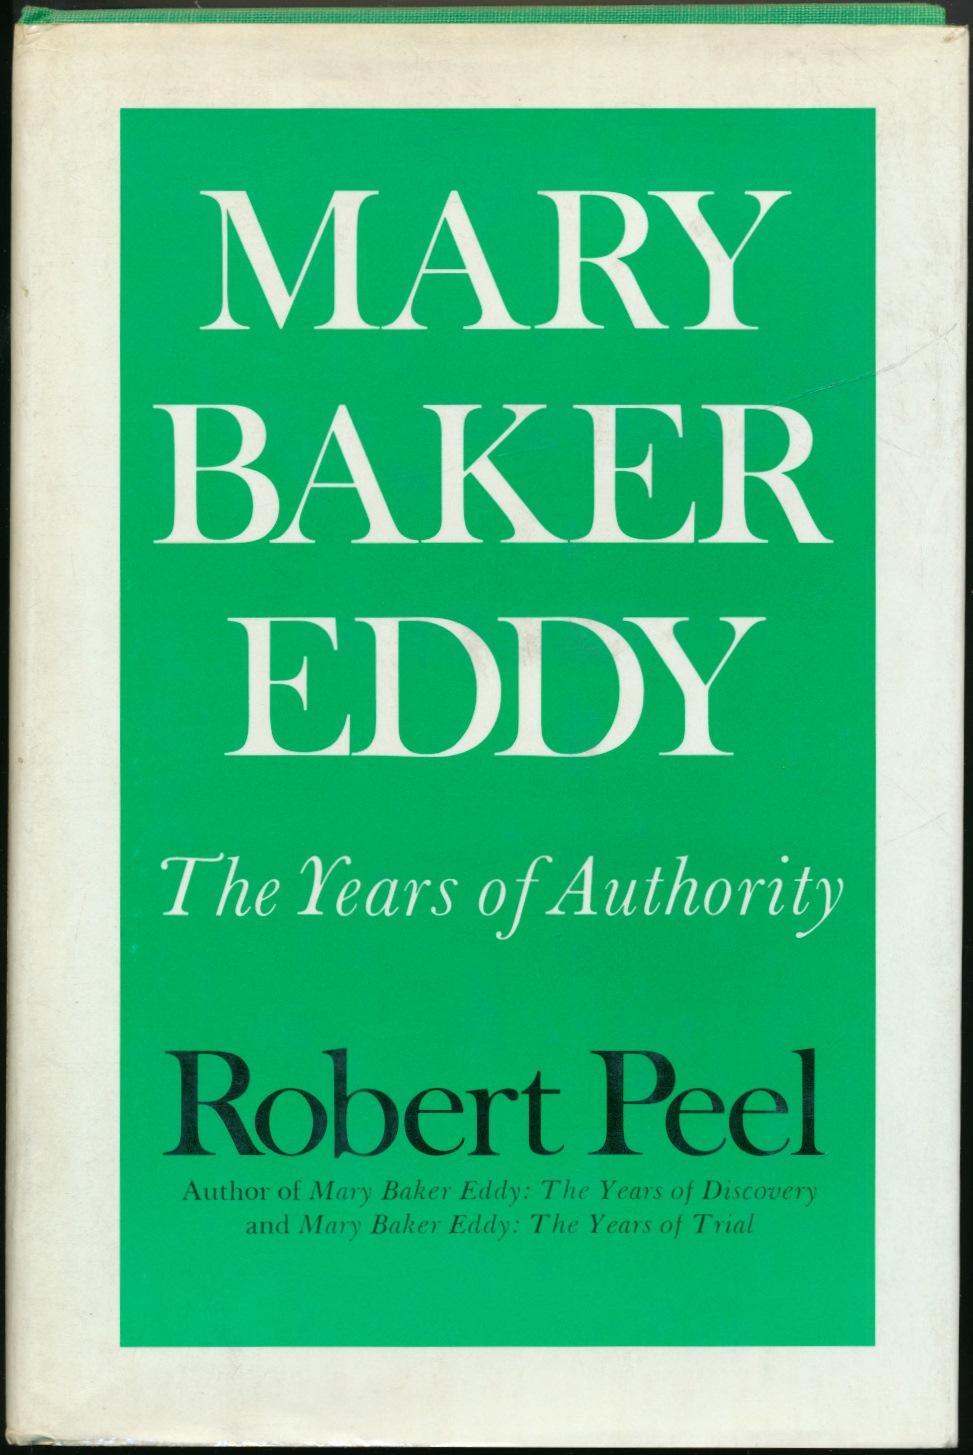 Mary Baker Eddy: The Years of Authority. - PEEL, Robert.